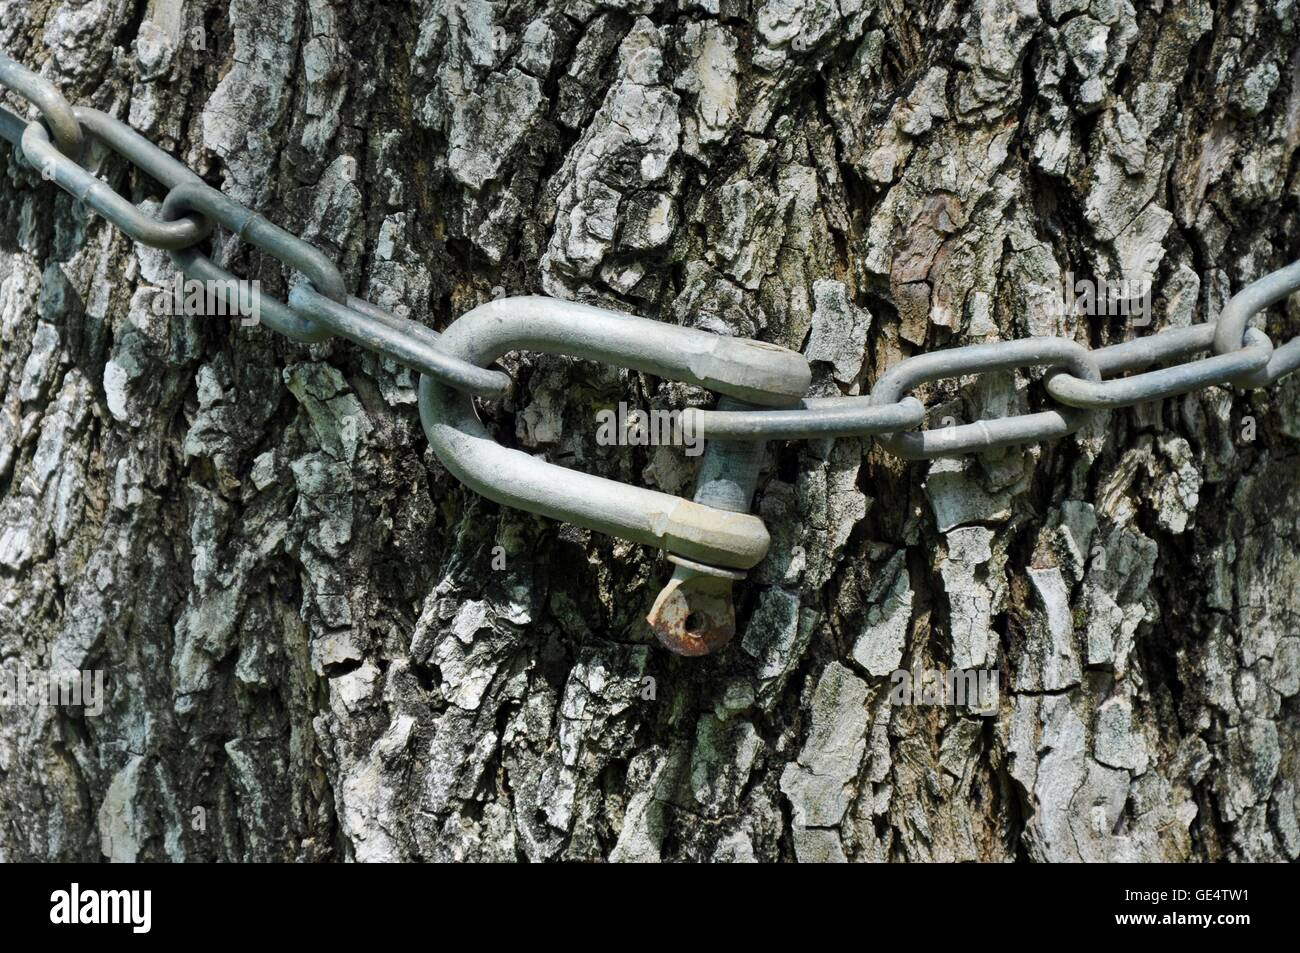 Metal Wrapped Stockfotos & Metal Wrapped Bilder - Alamy